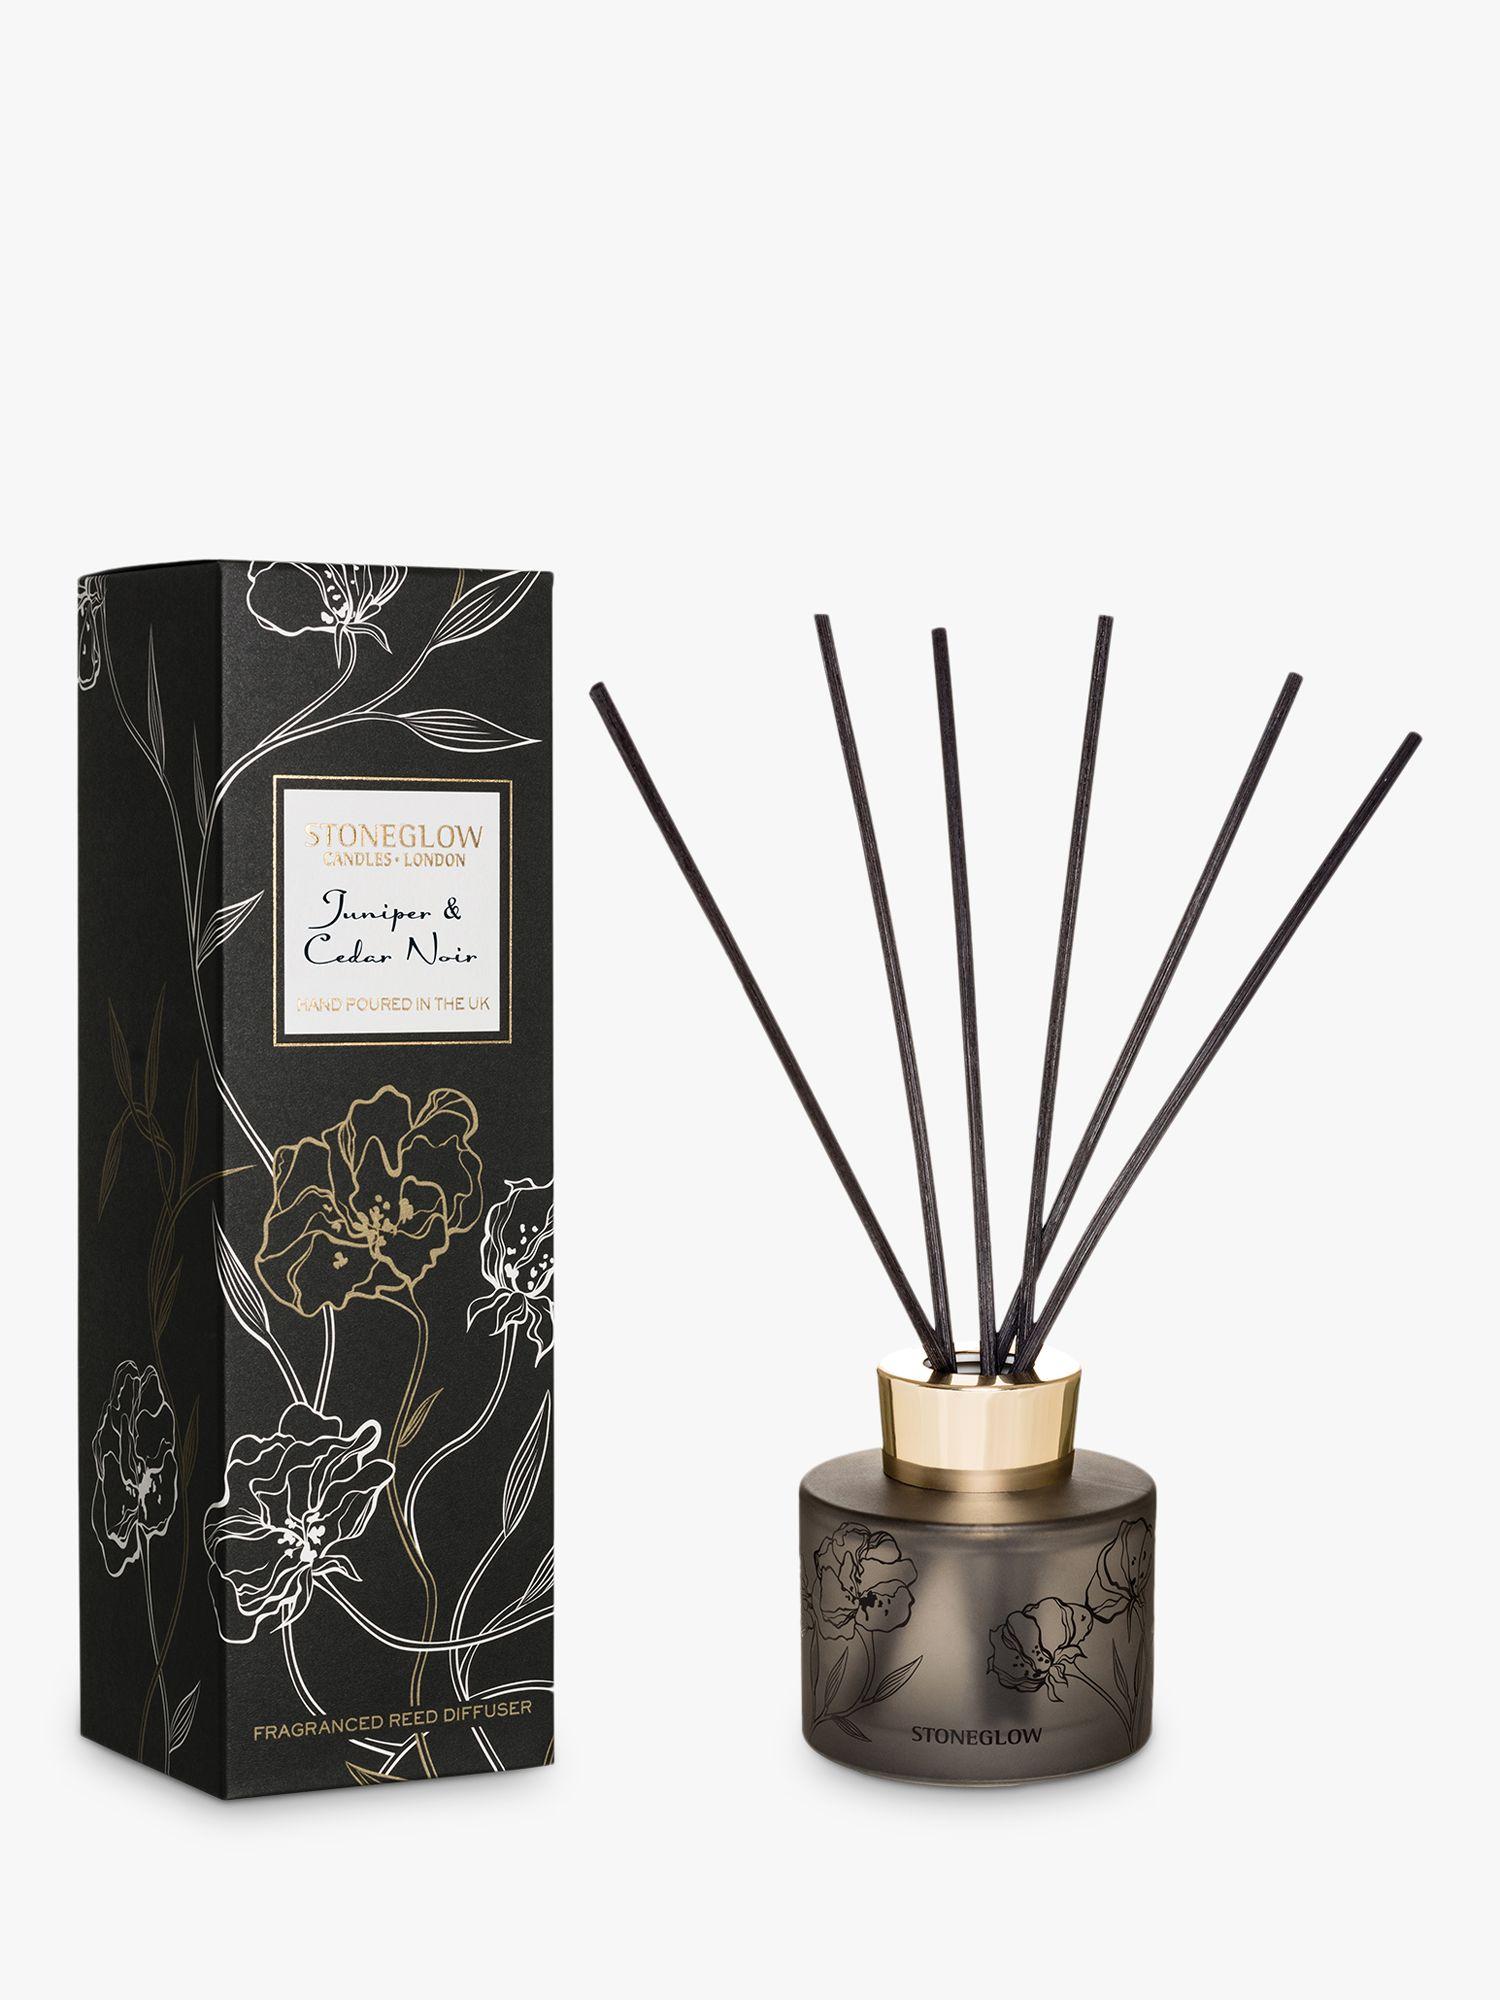 Stoneglow Stoneglow Juniper & Cedar Noir Reed Diffuser, 120ml